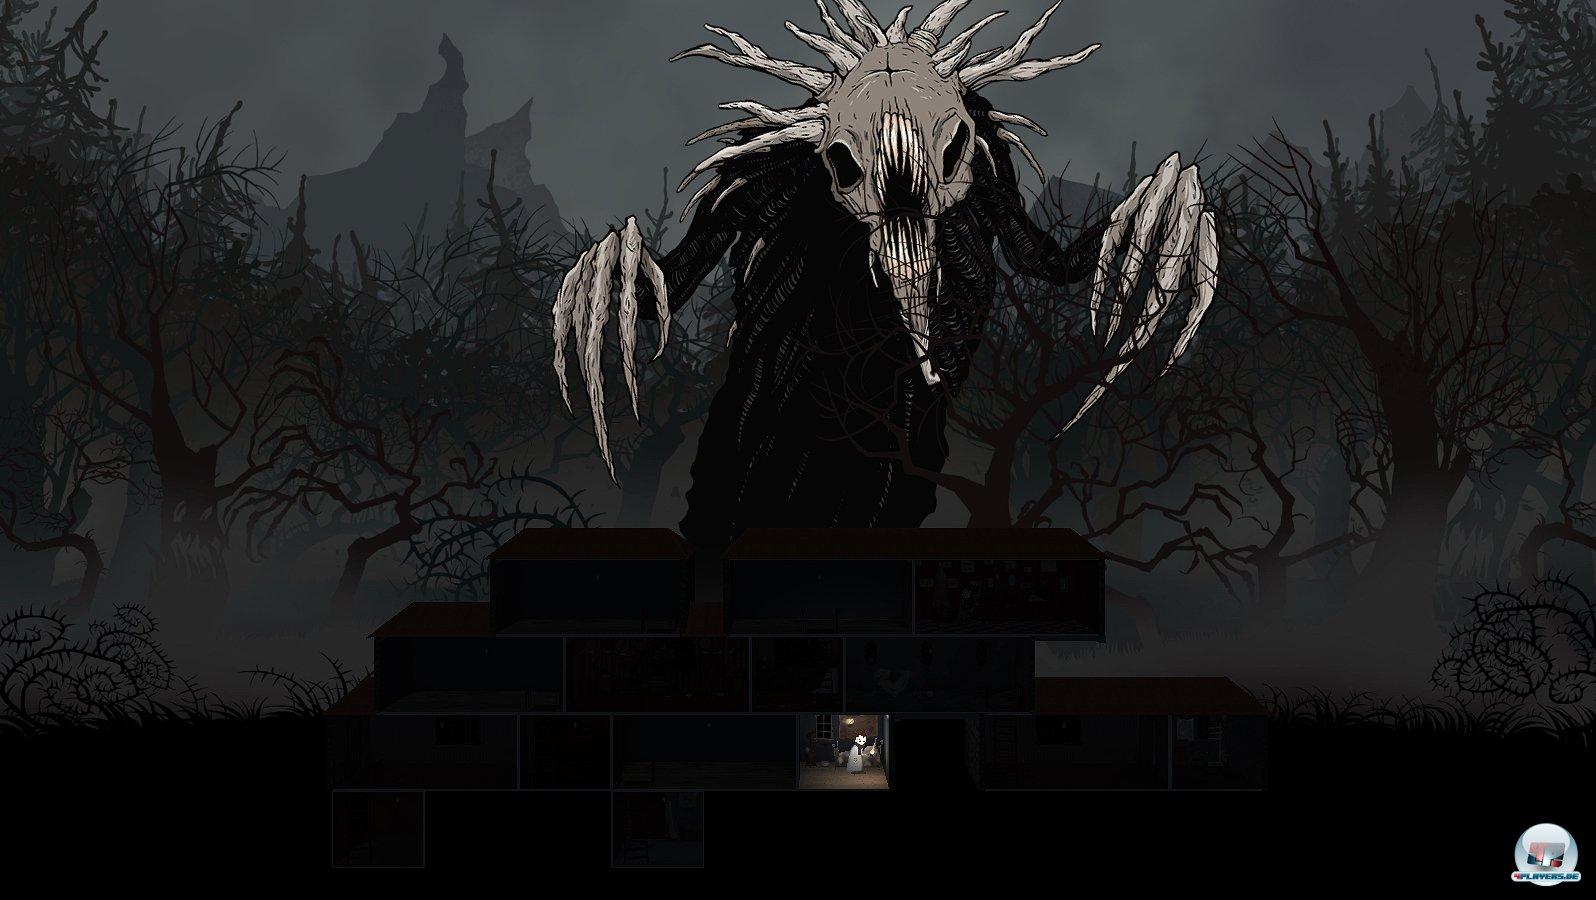 Обзор игры To the Moon  StopGameru